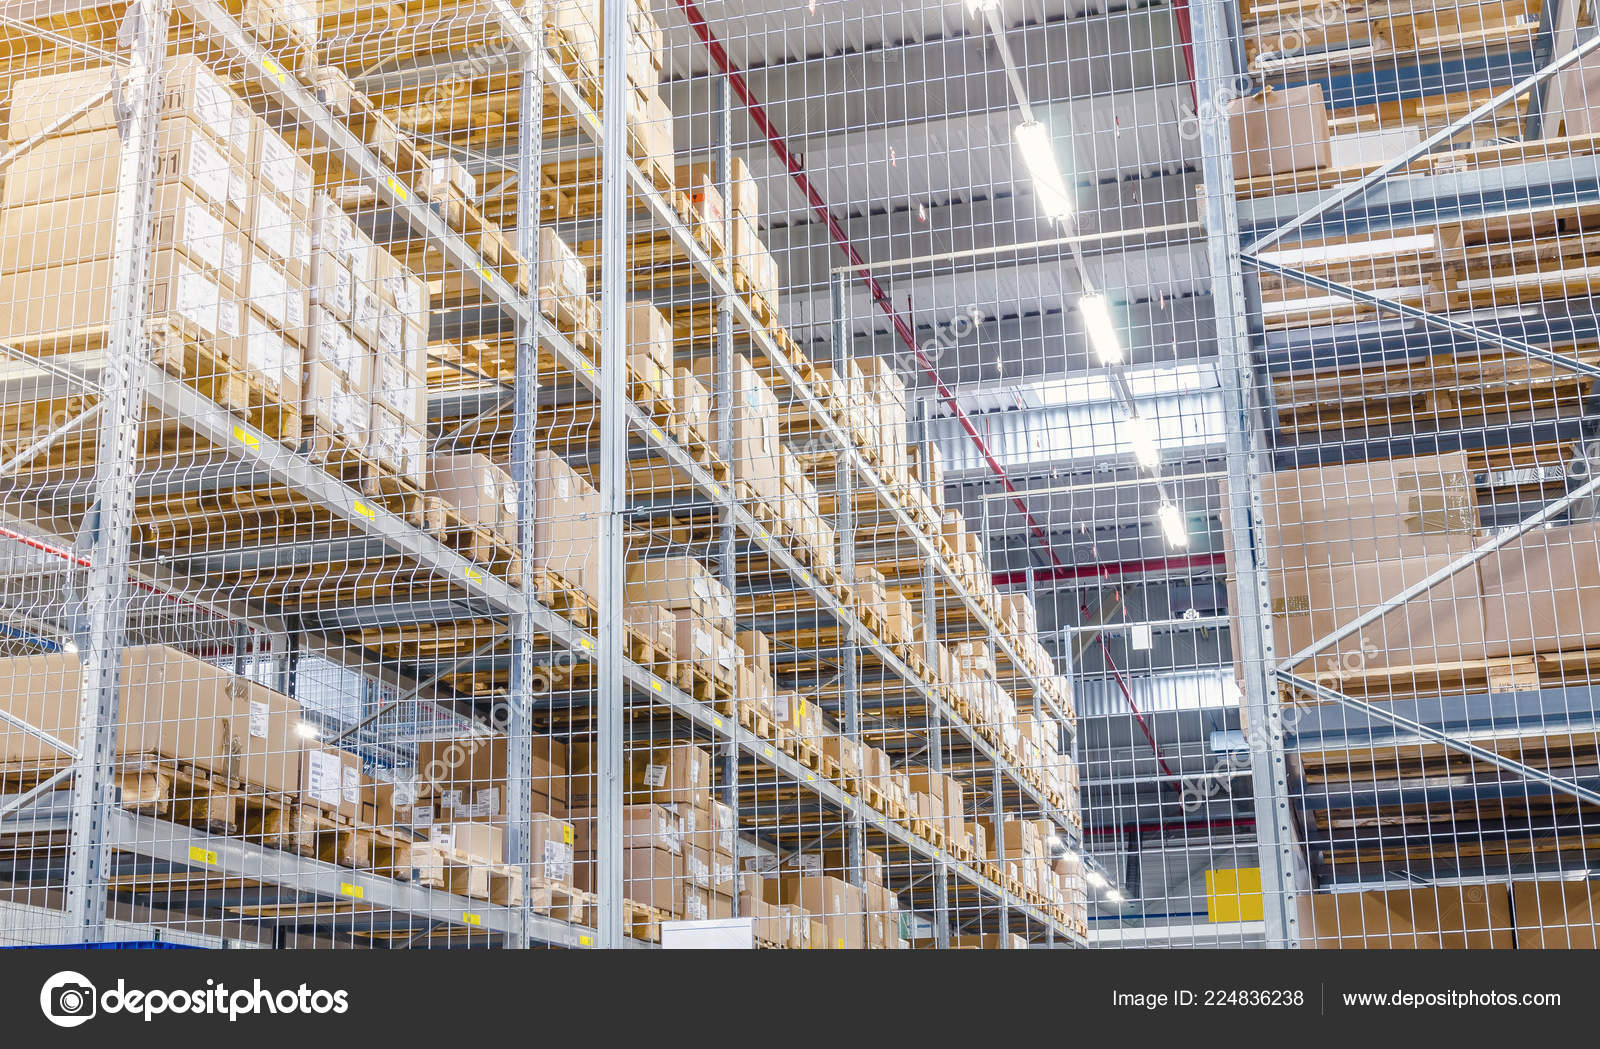 Storage industrial steel mesh, except reinforcing